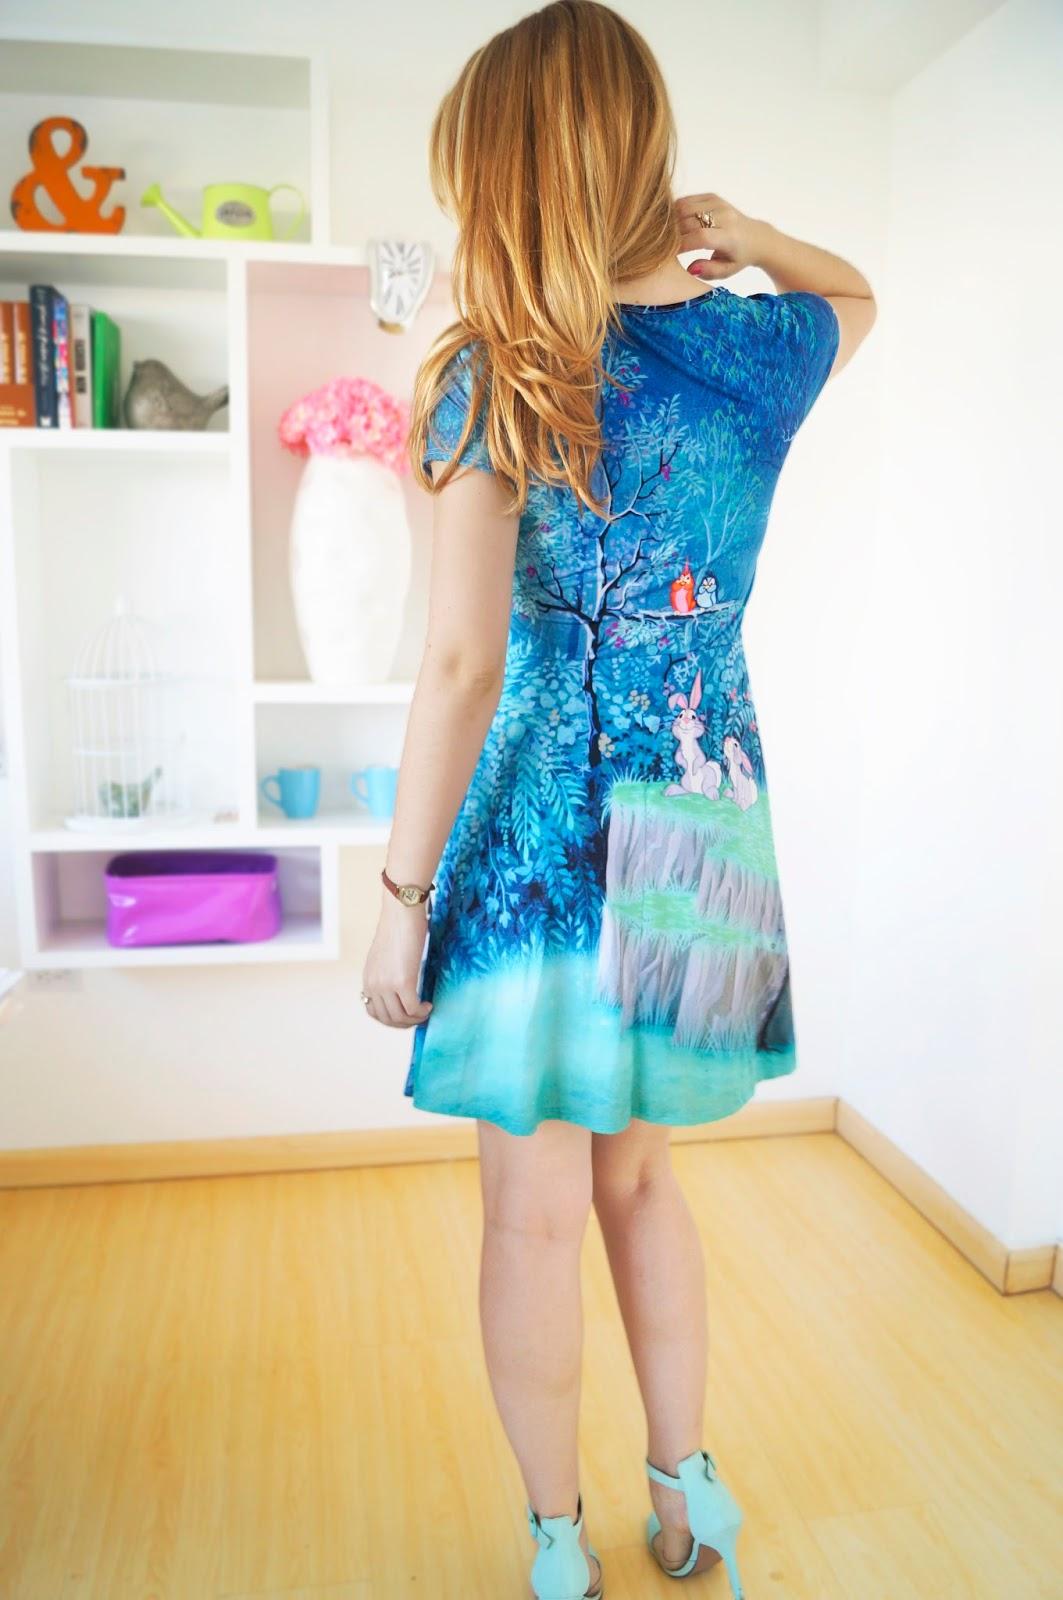 Disney Fashion, Sleeping Beauty Dress